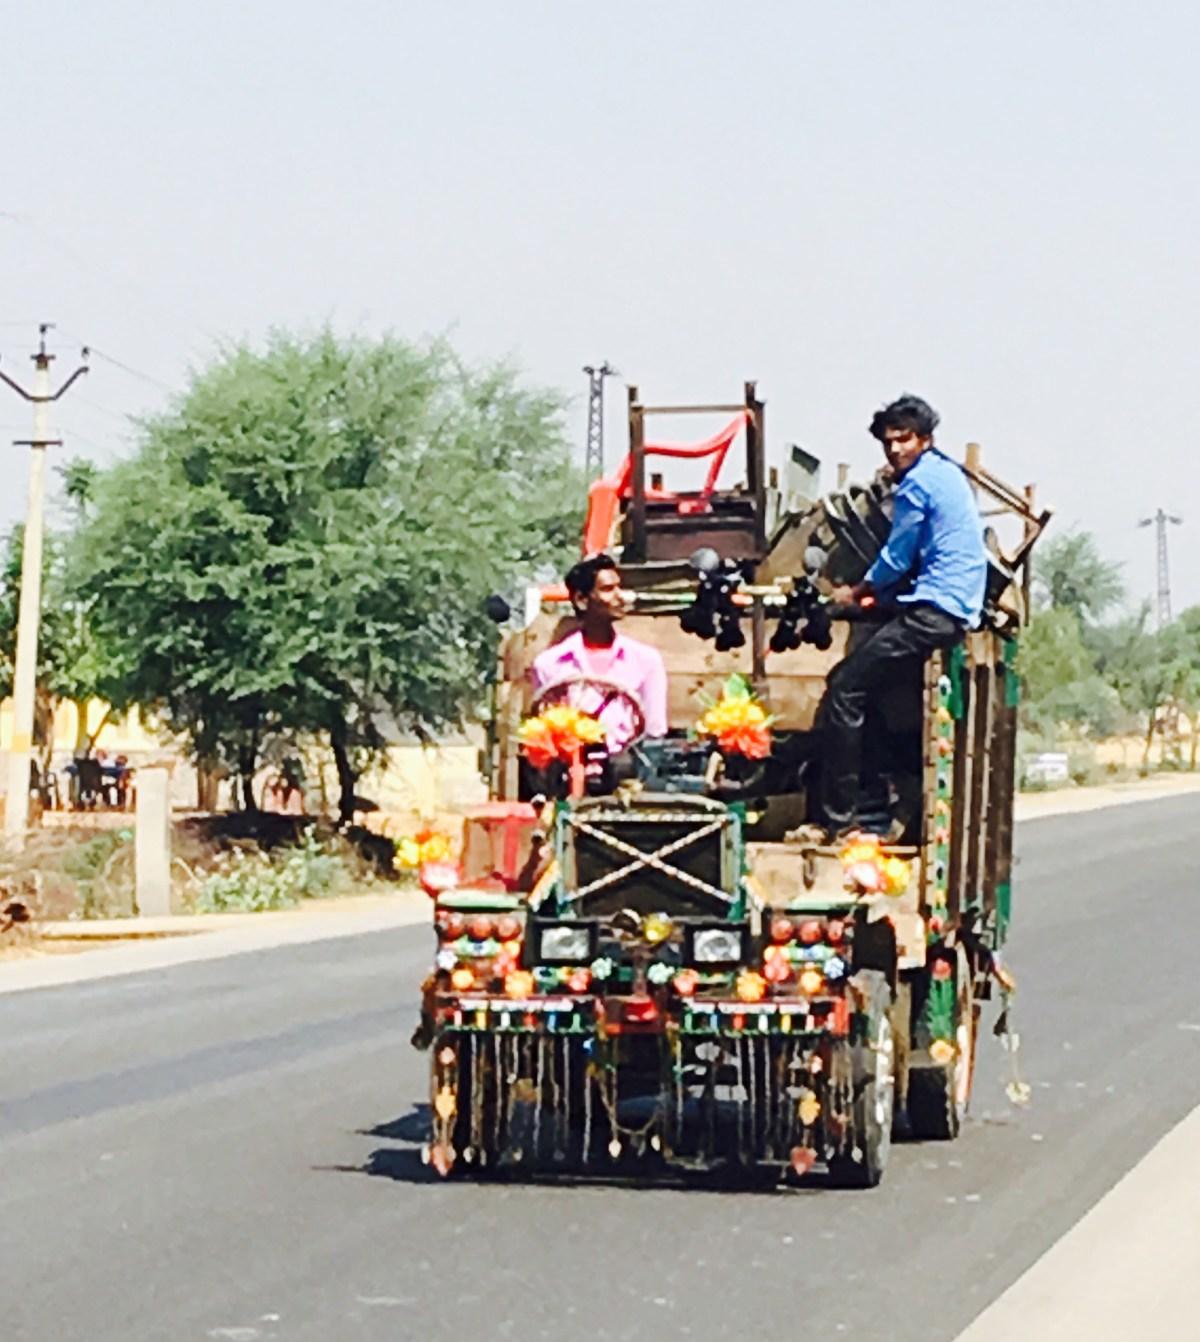 Pimp my ride India style